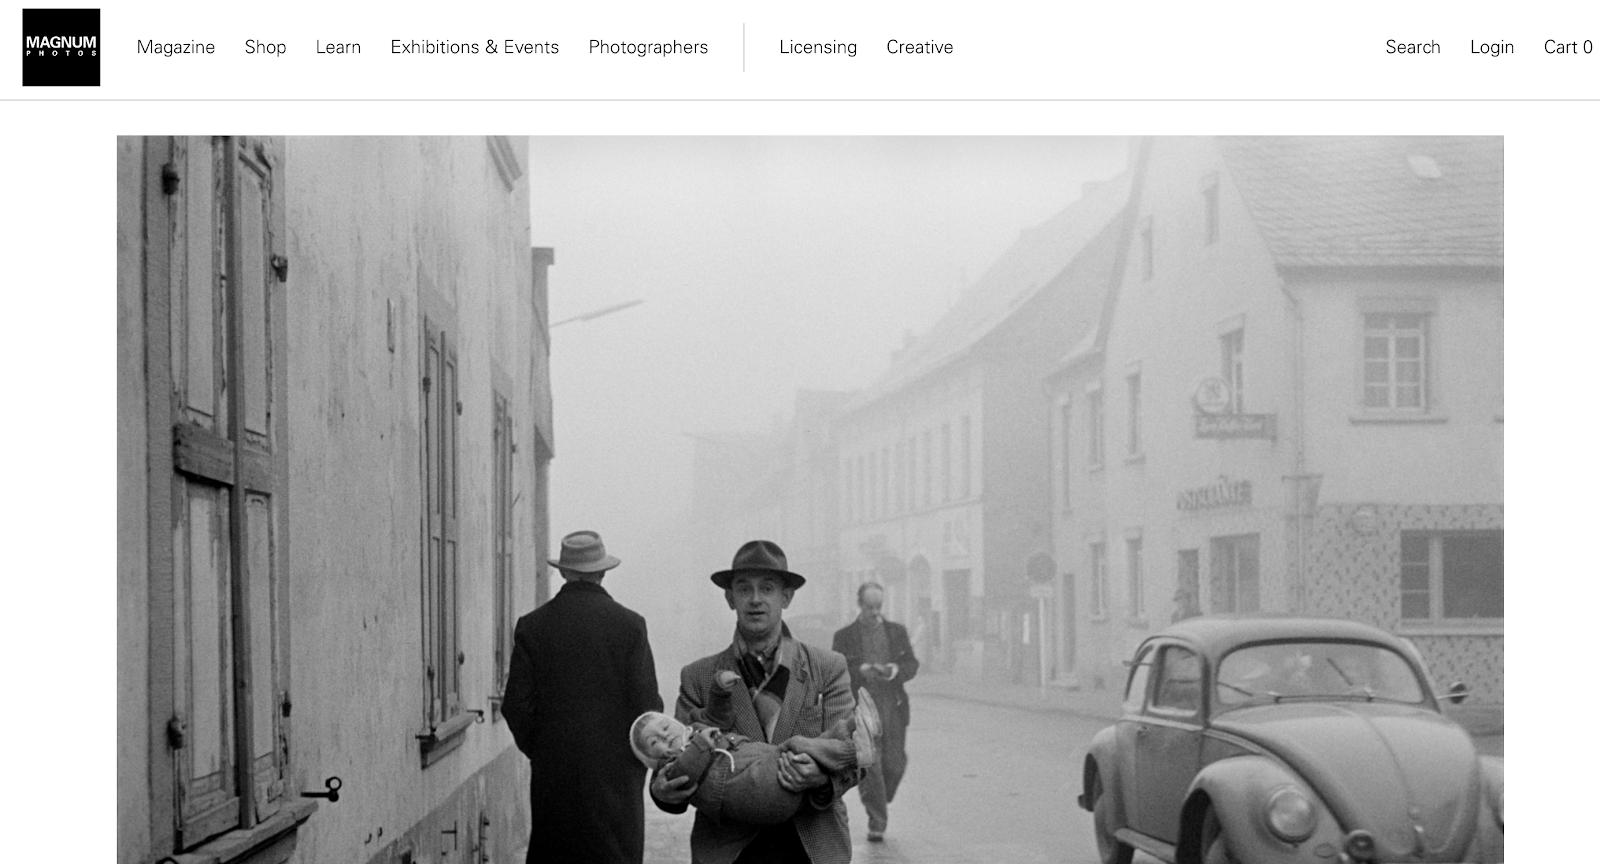 Magnum Photos Homepage Screenshot (Blog Layout Examples)